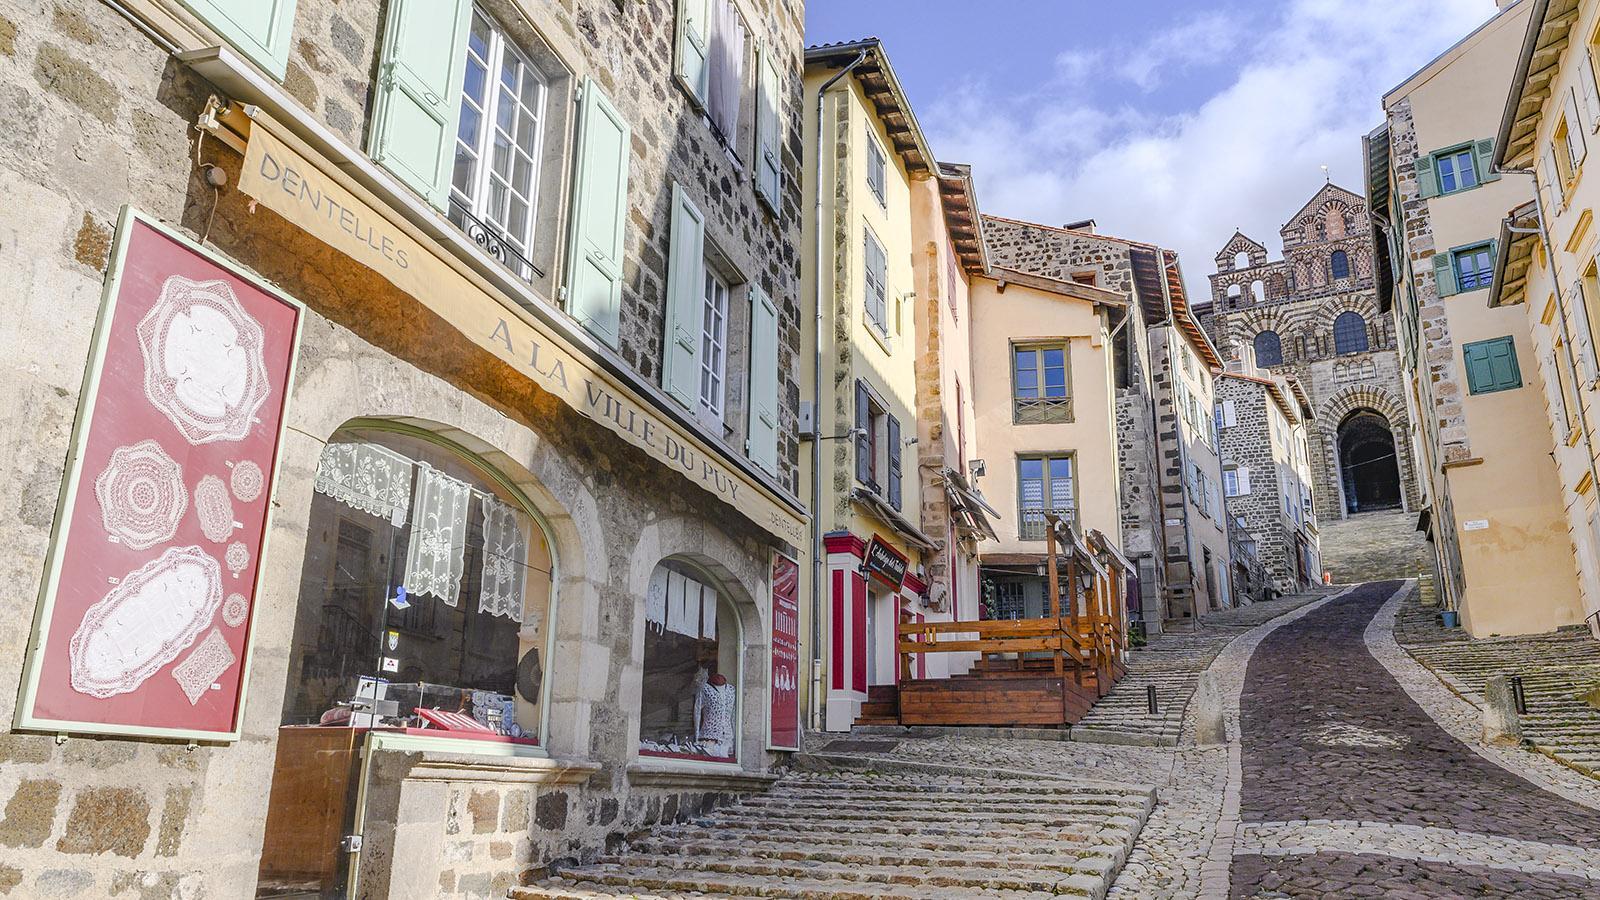 Die Freitreppe zur Kathedrale von Le Puy-en-Velay. Foto: Hilke Maunder